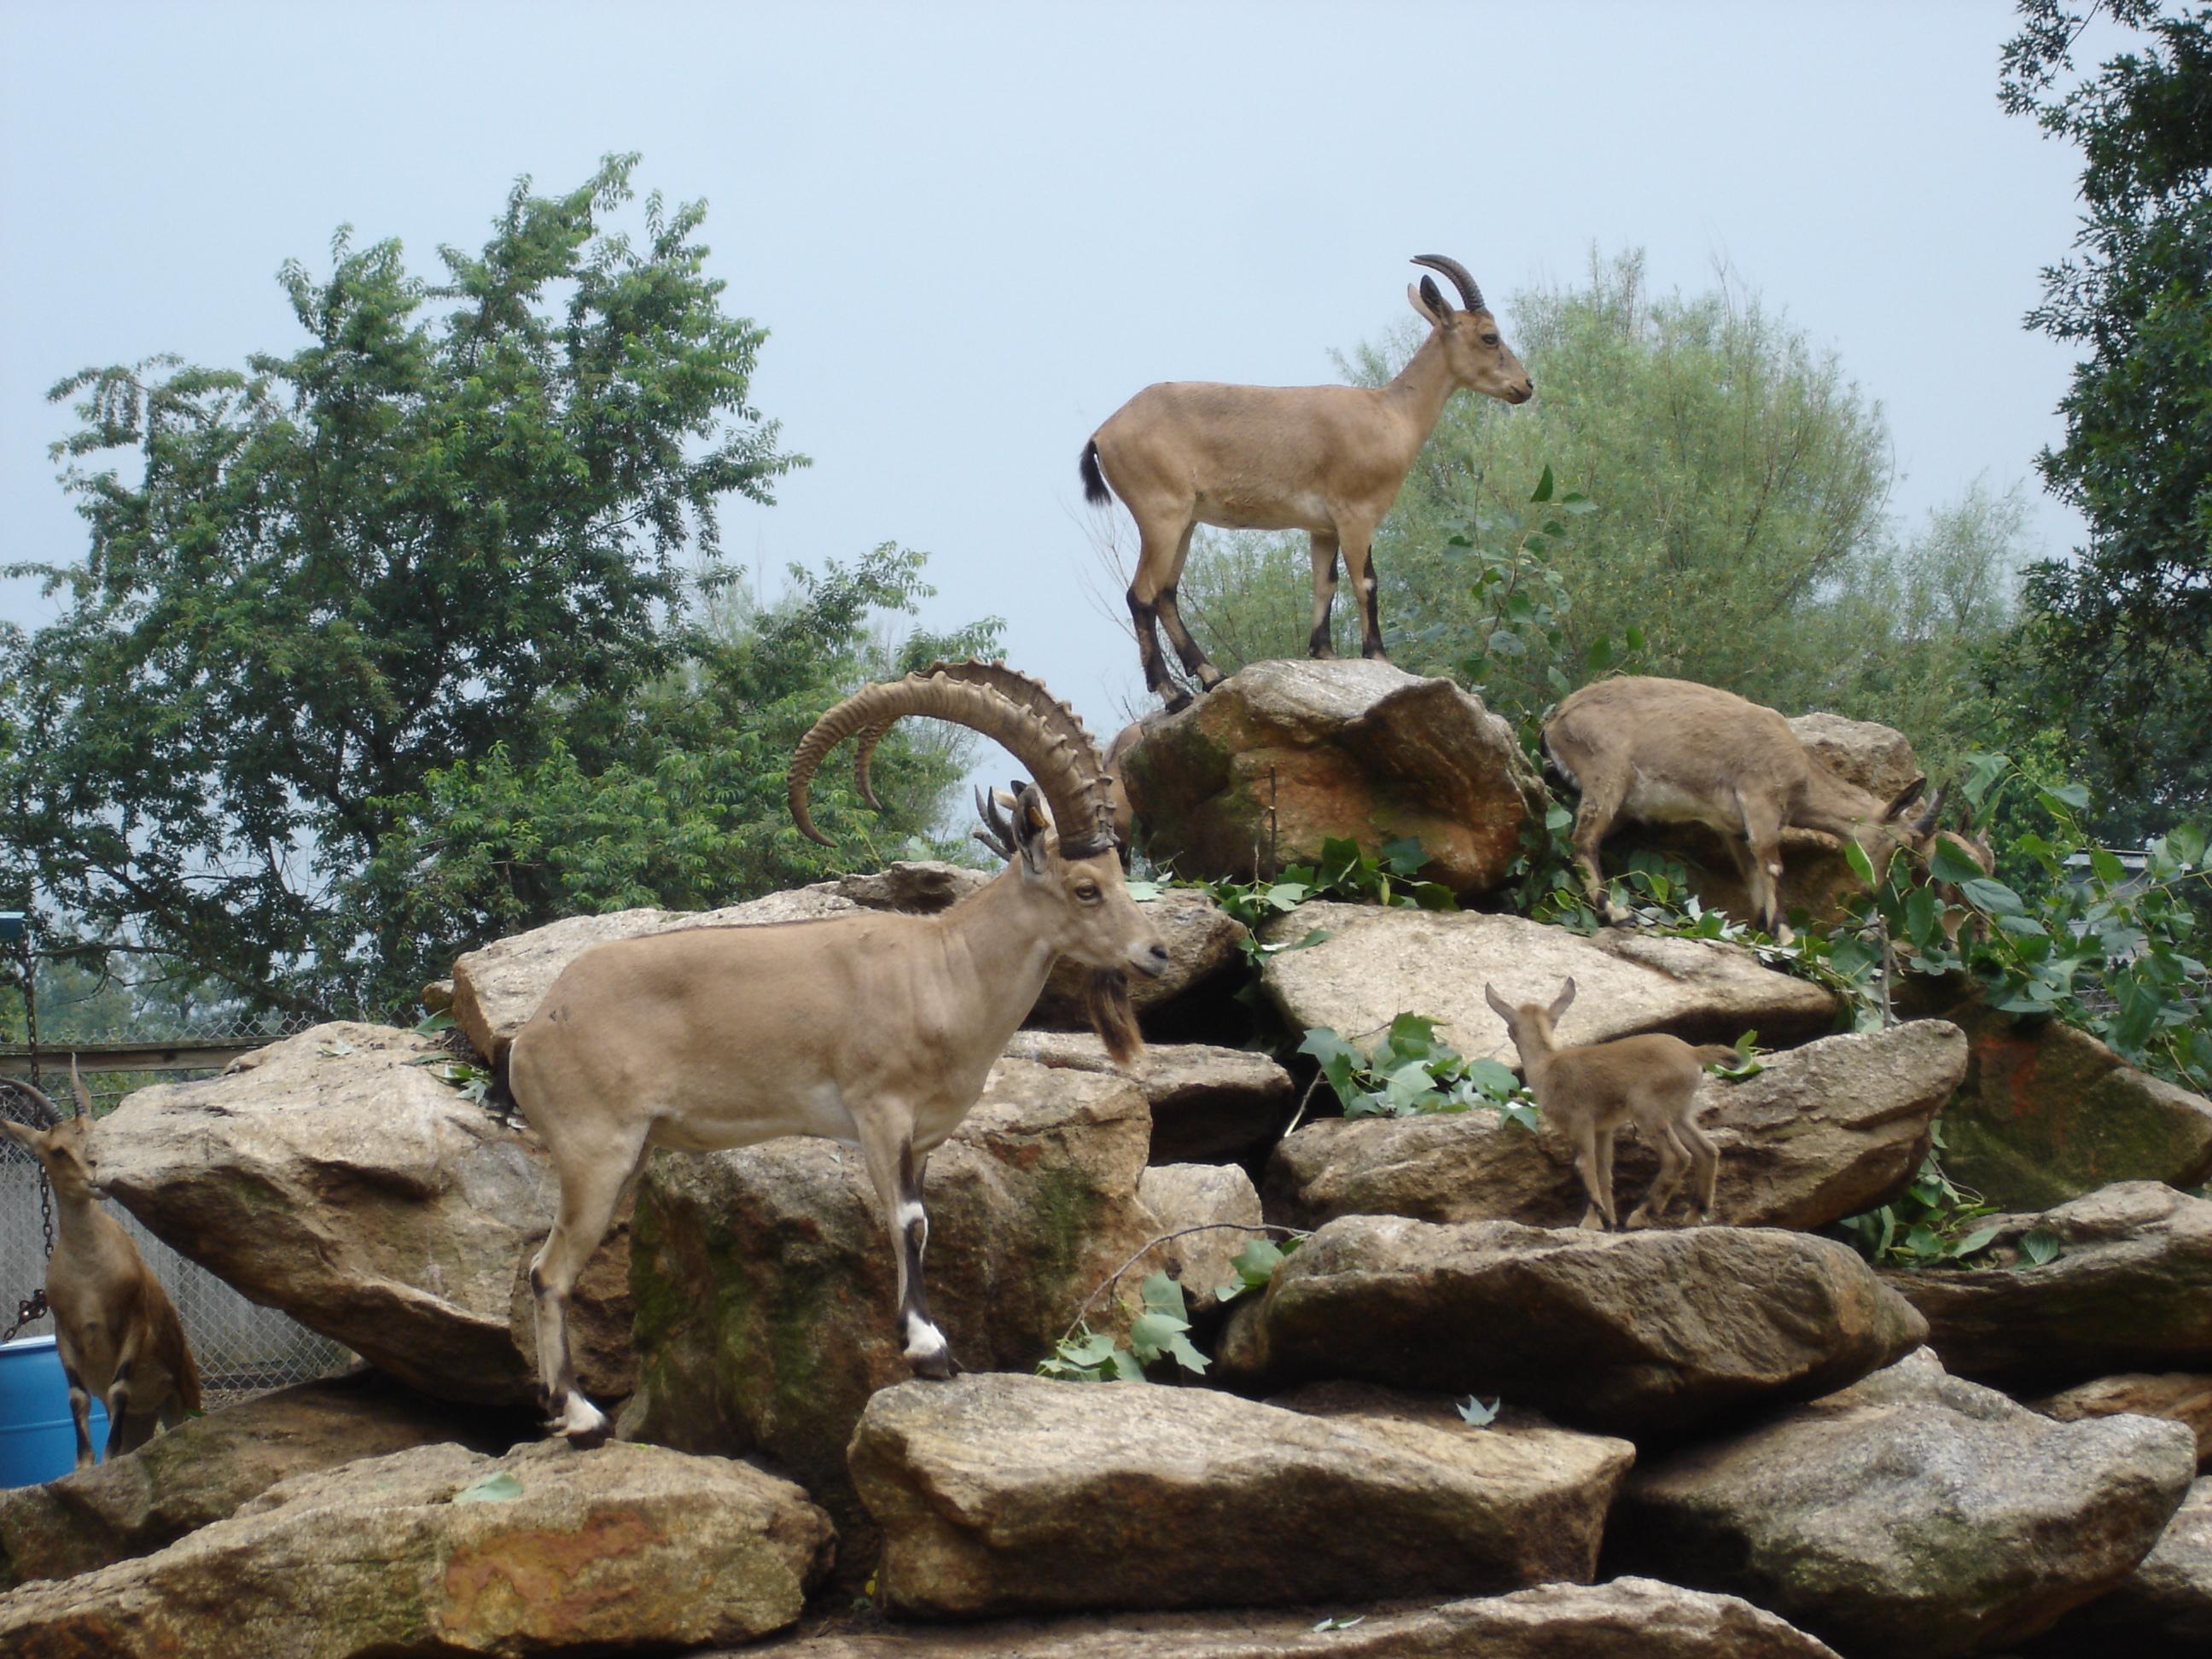 Pics of Turs and Ibex 11-30-10 095